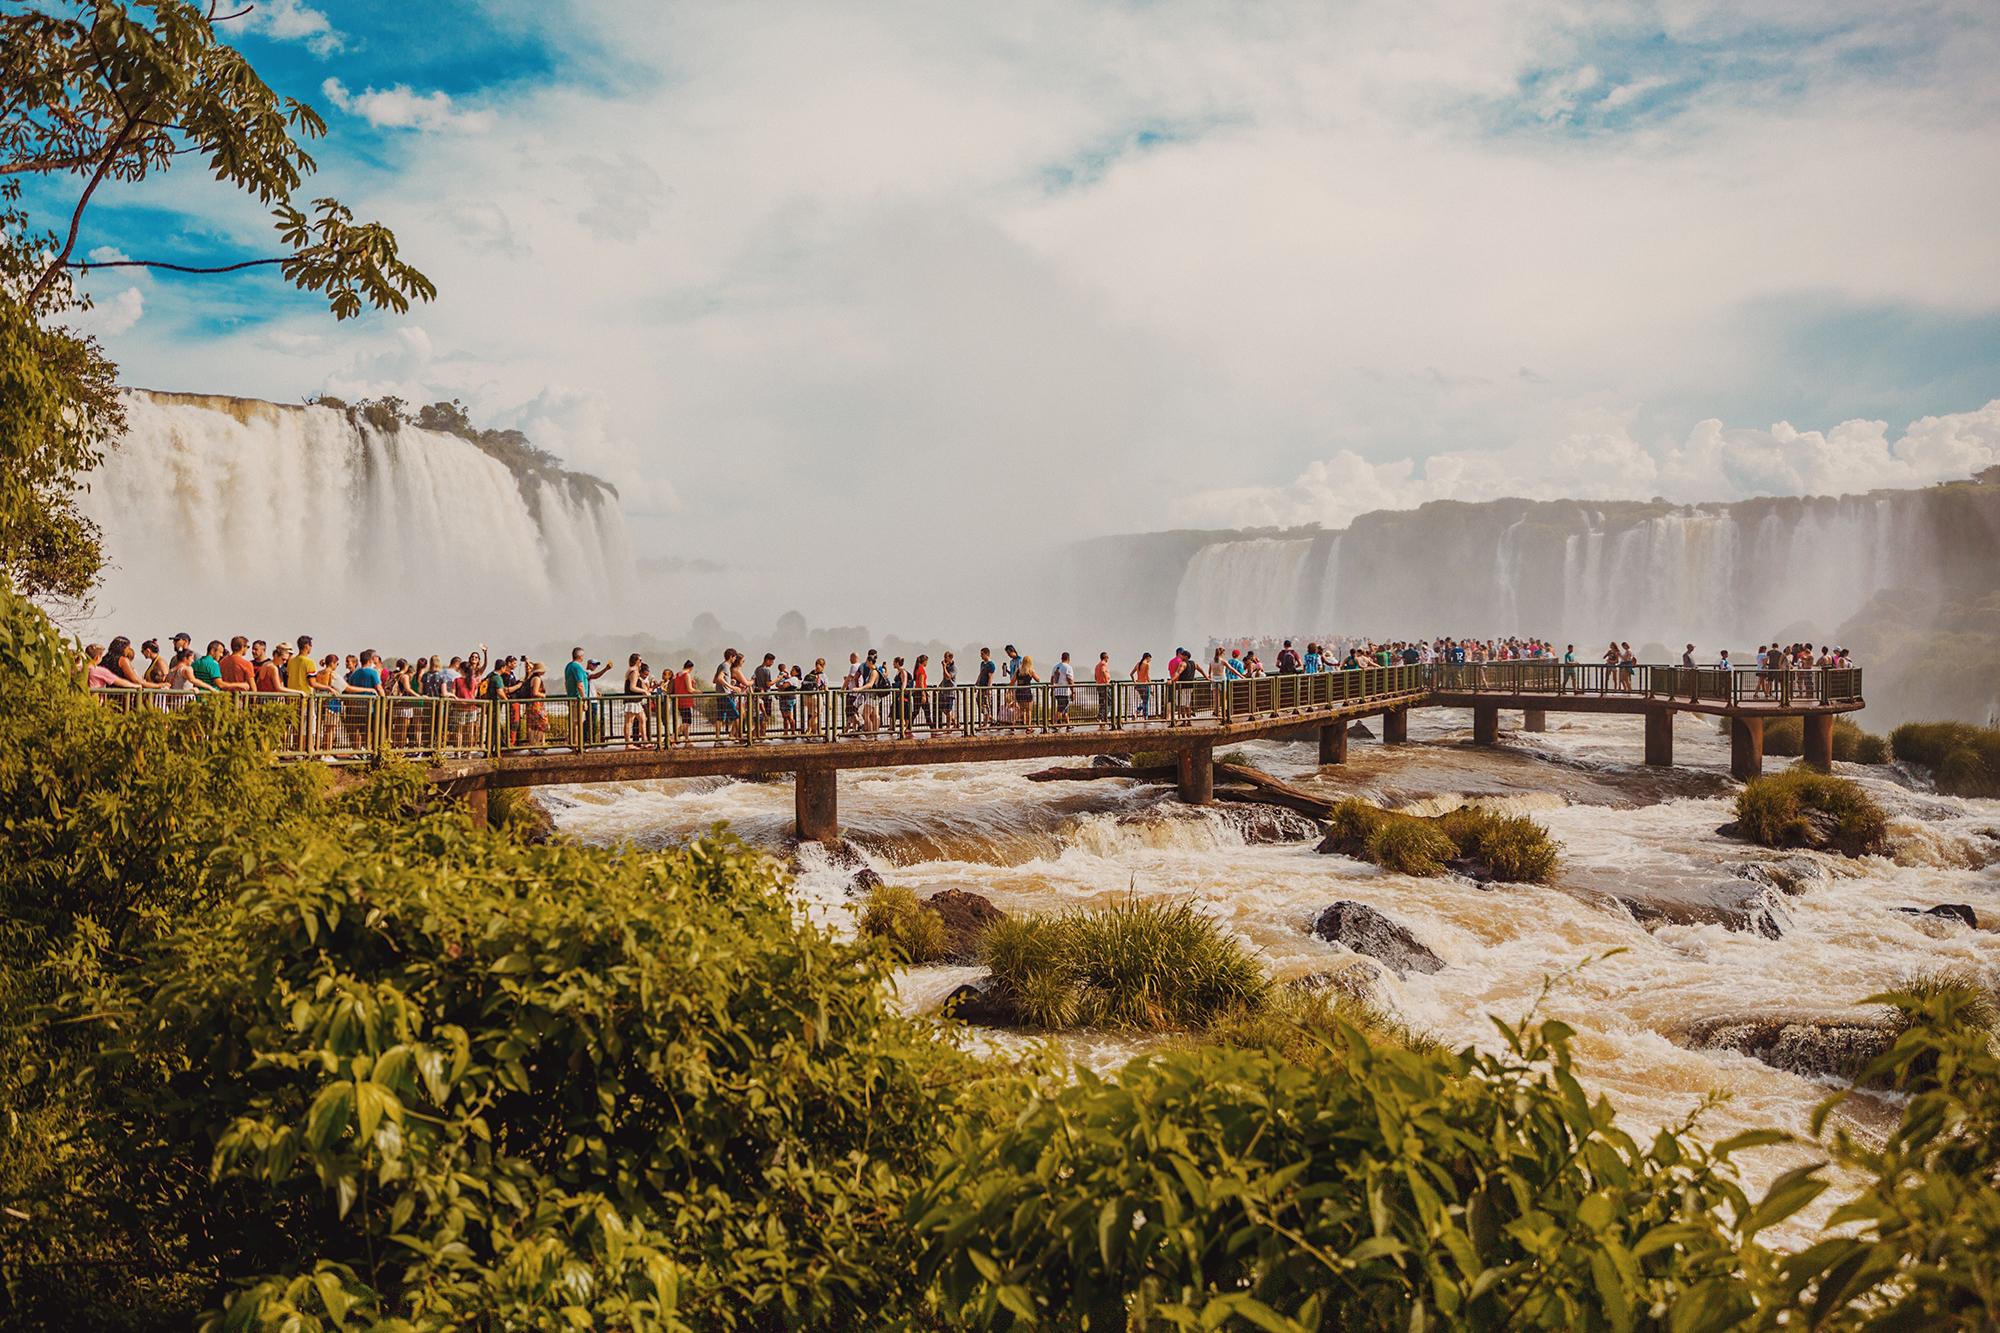 Black Panther - Argentina's Iguazu Falls